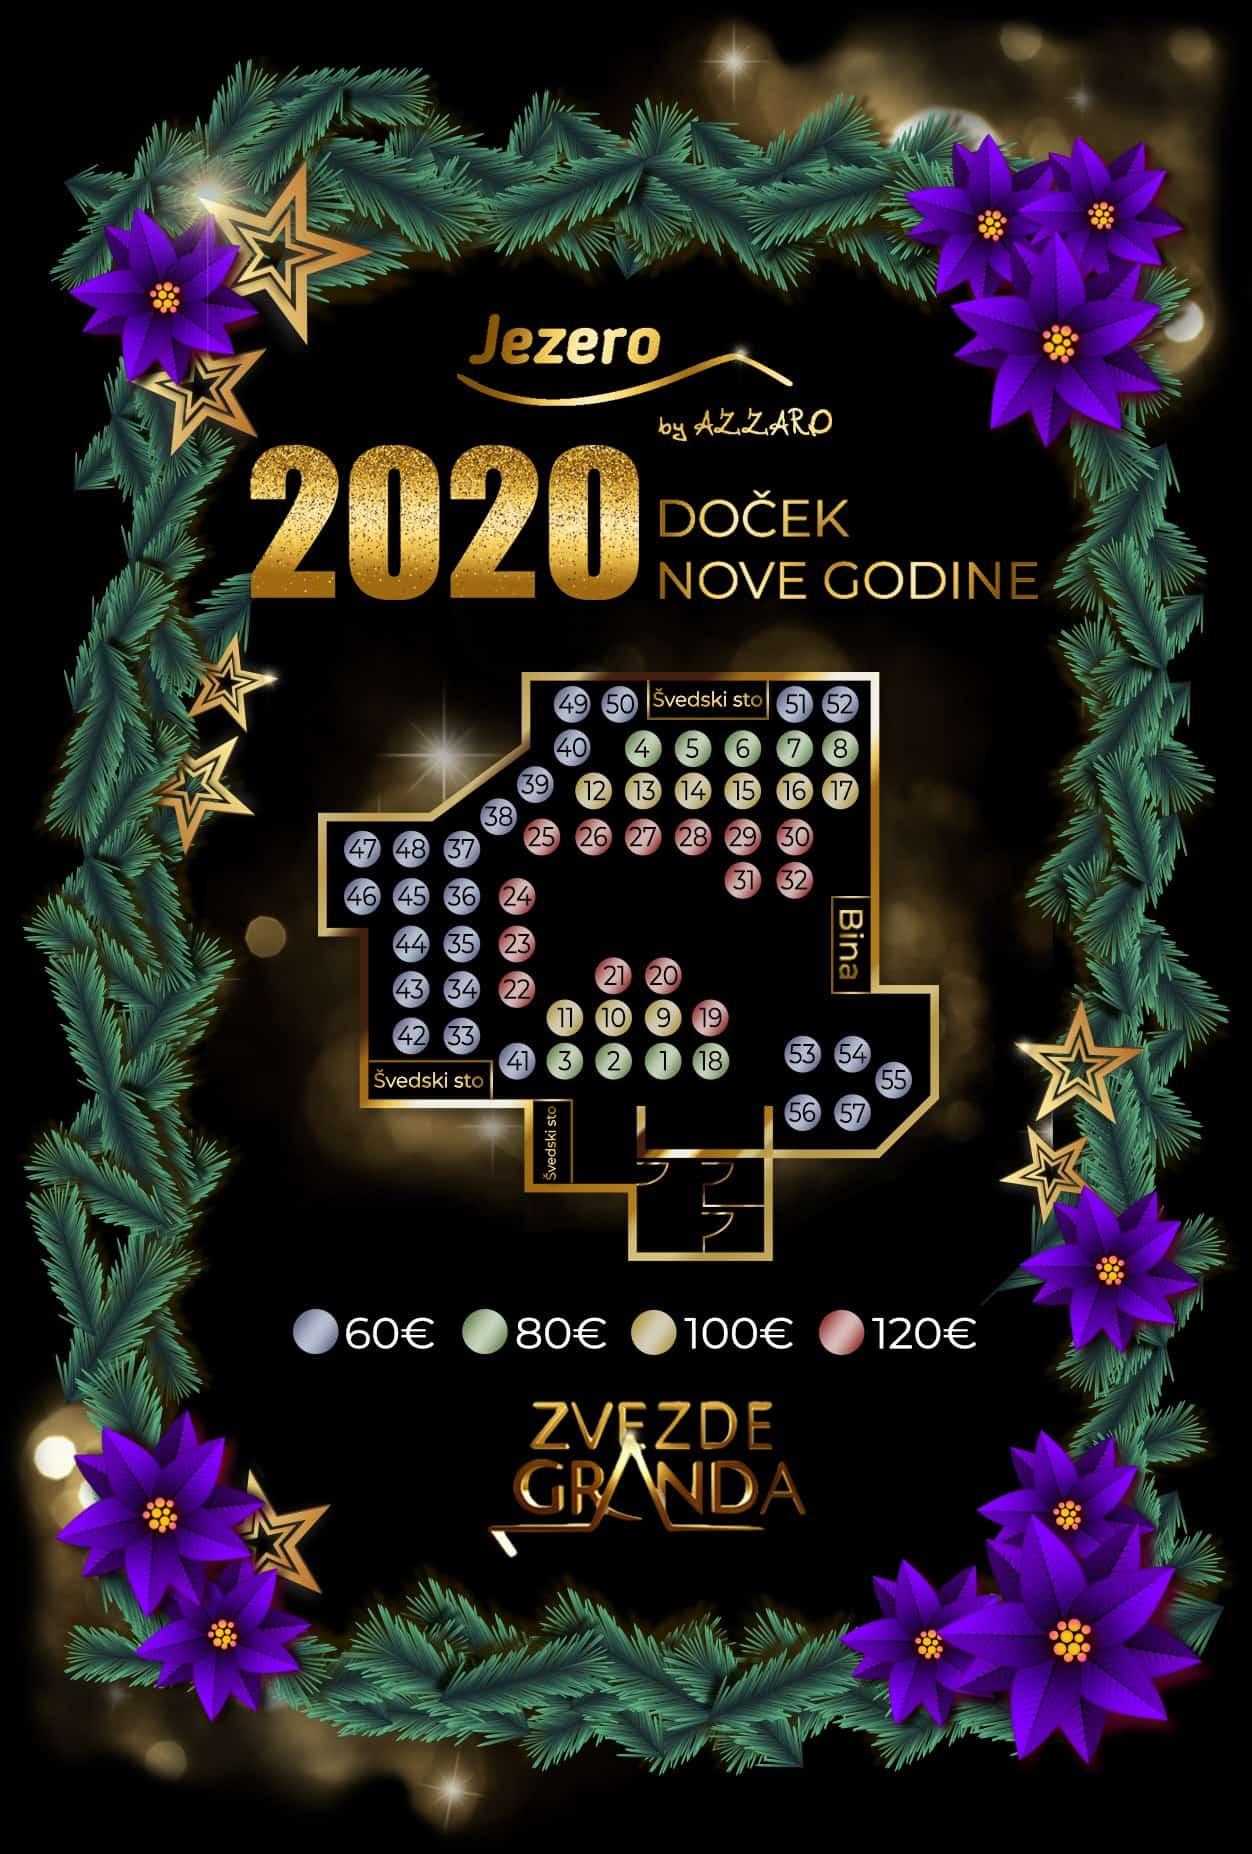 Docek Nove godine 2020 Beograd Restoran Jezero by Azzaro Ada Ciganlija mapa 1